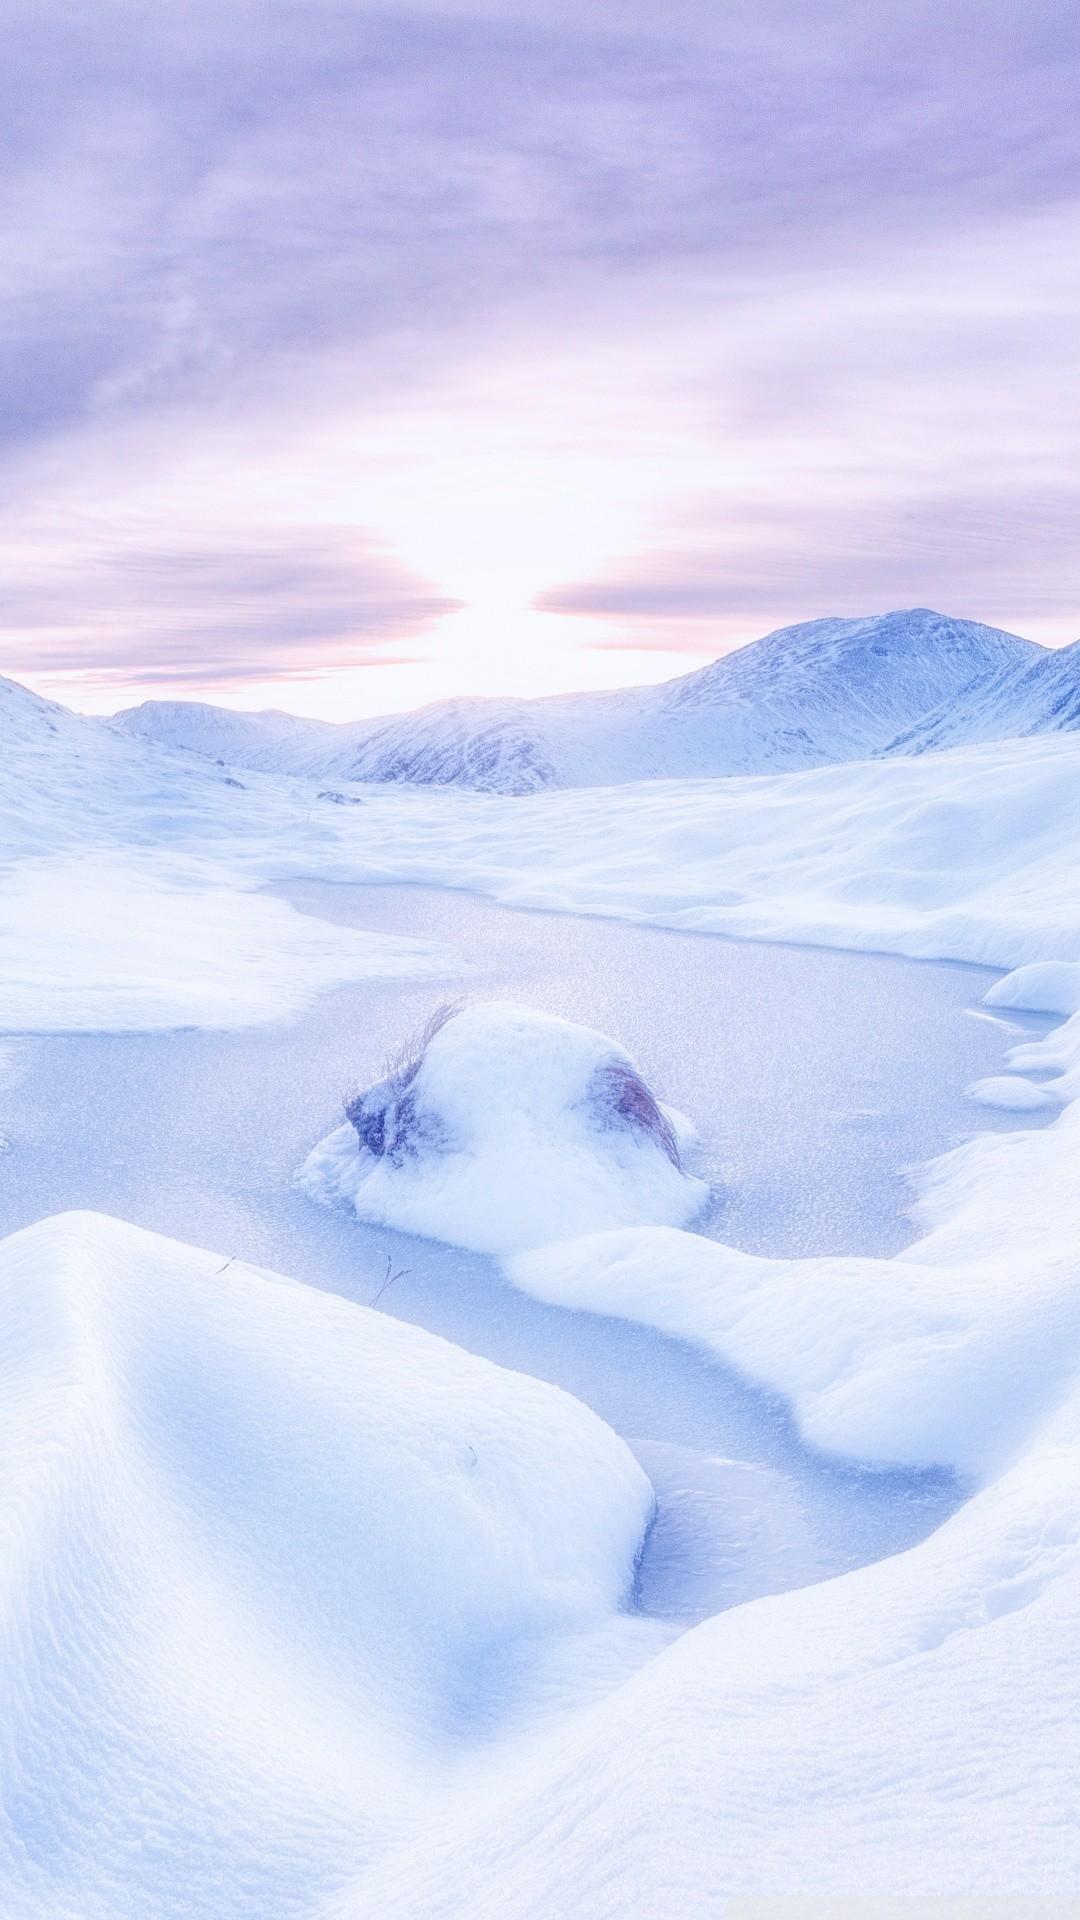 Free Scottish Highlands Winter phone wallpaper by angelbaby2011